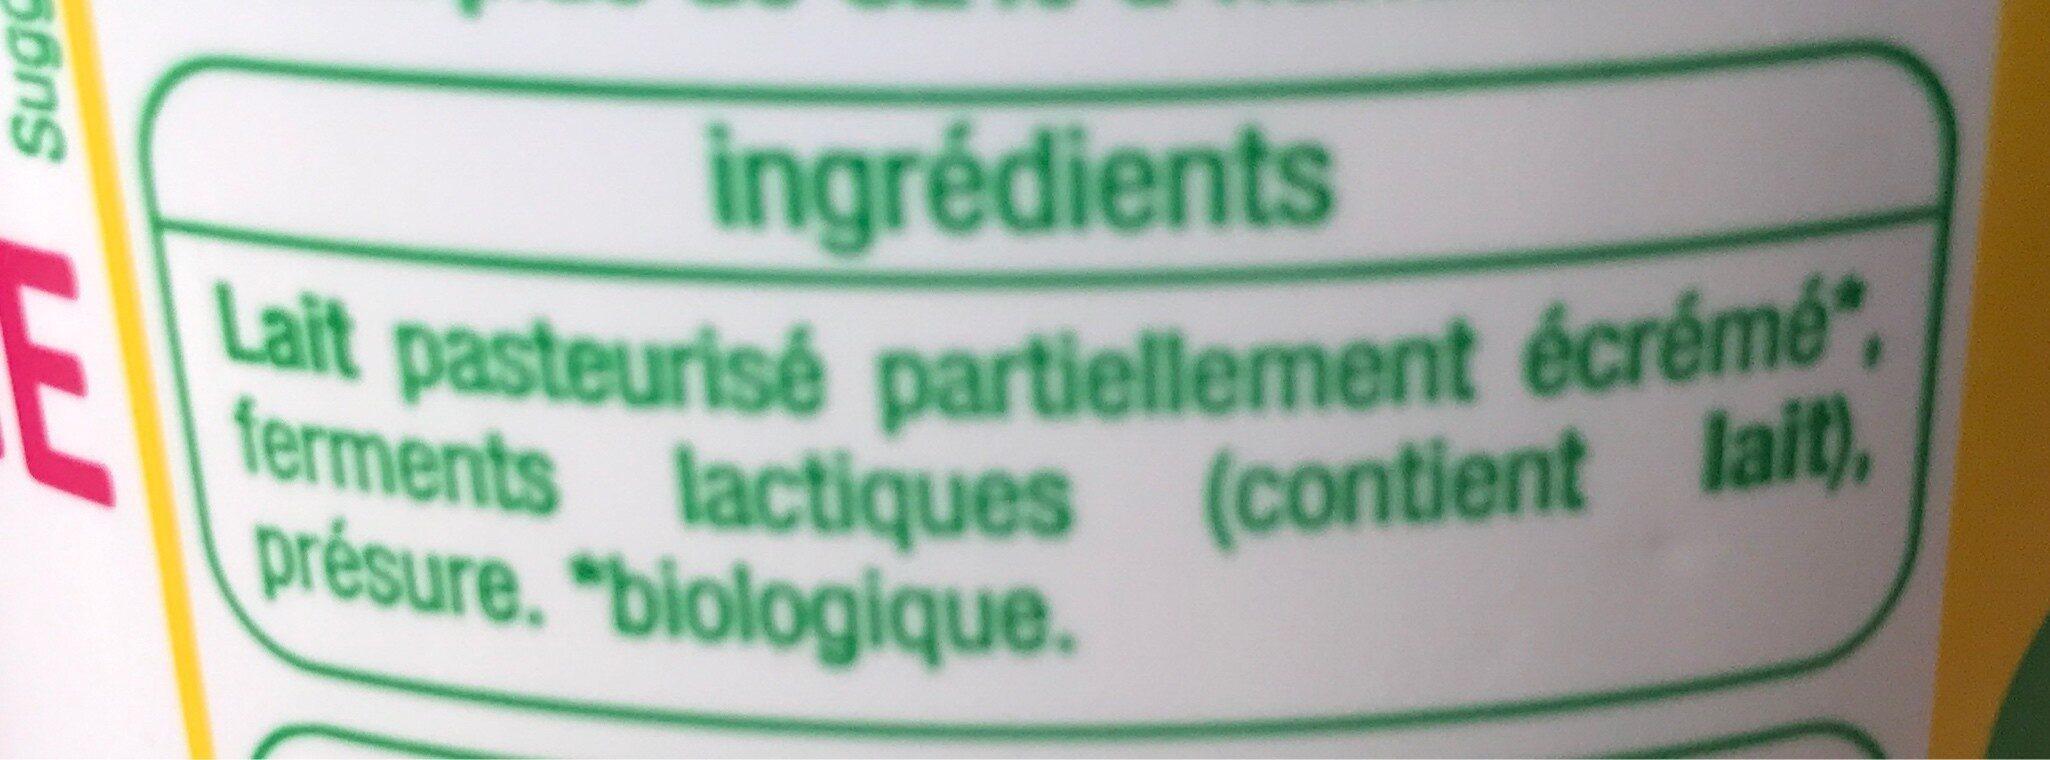 Fromage blanc issu de l'agriculture biologique - Ingrediënten